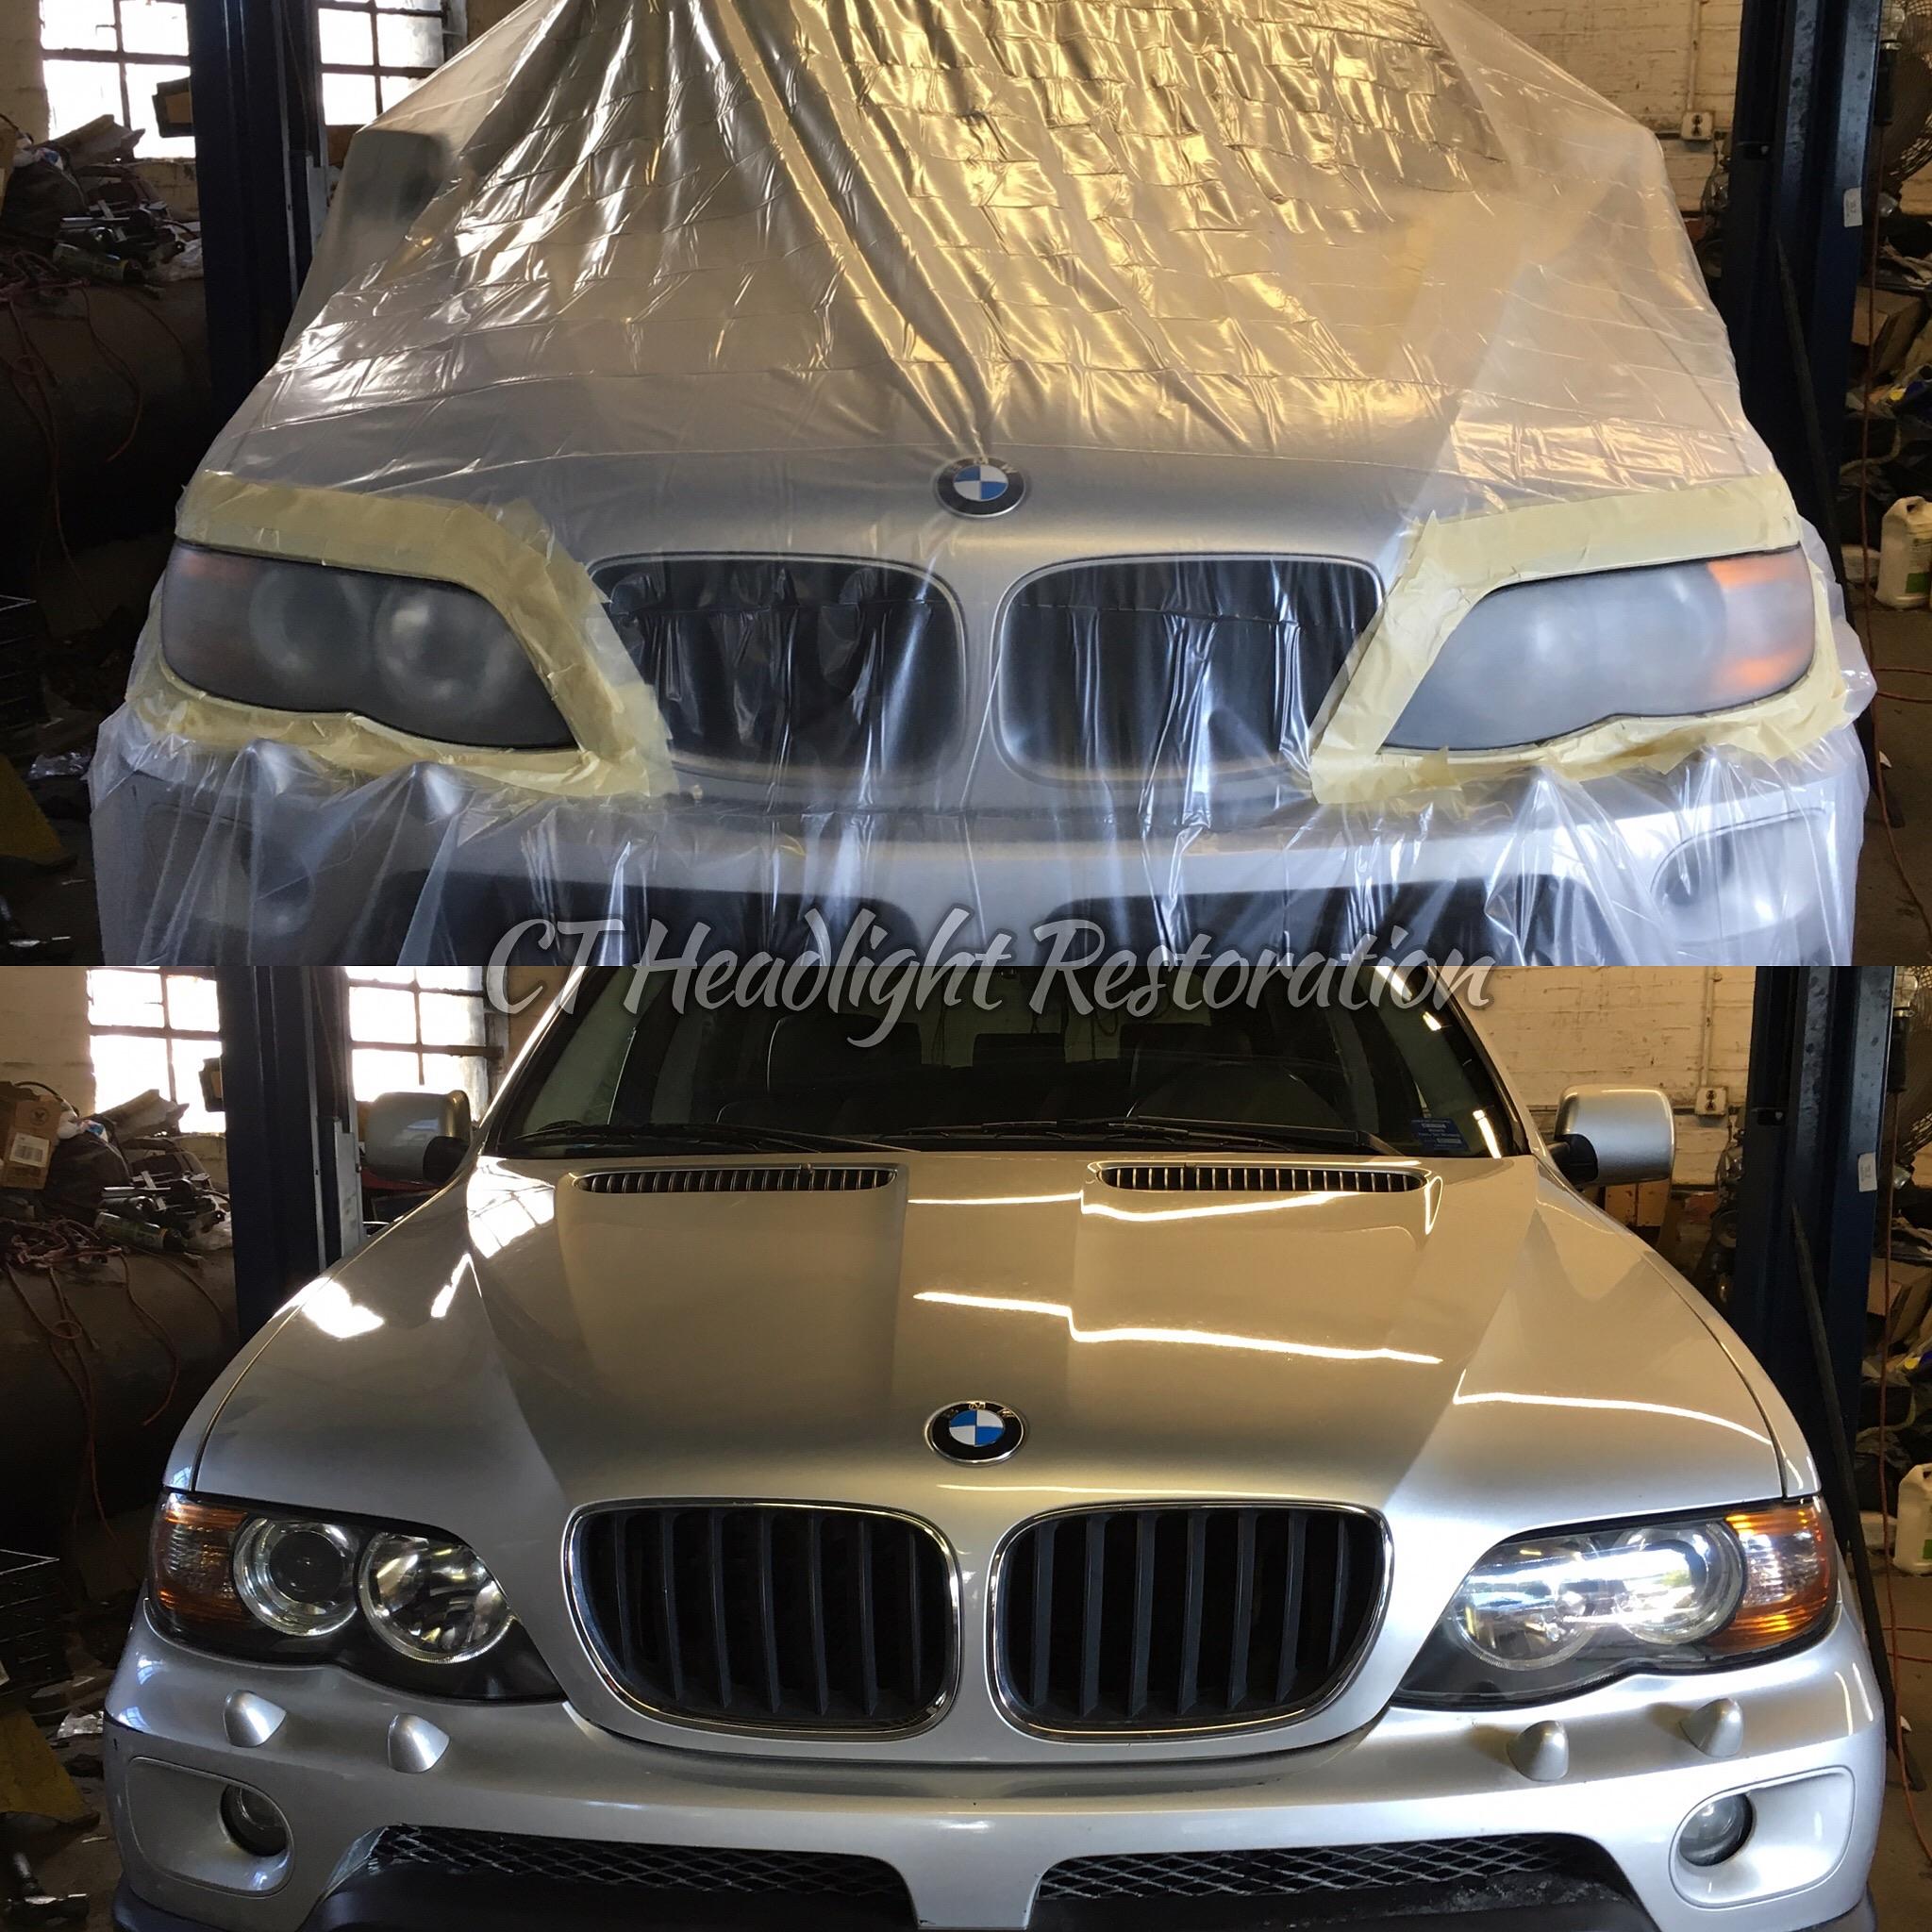 BMW X5 Professional Headlight Restoration.jpg